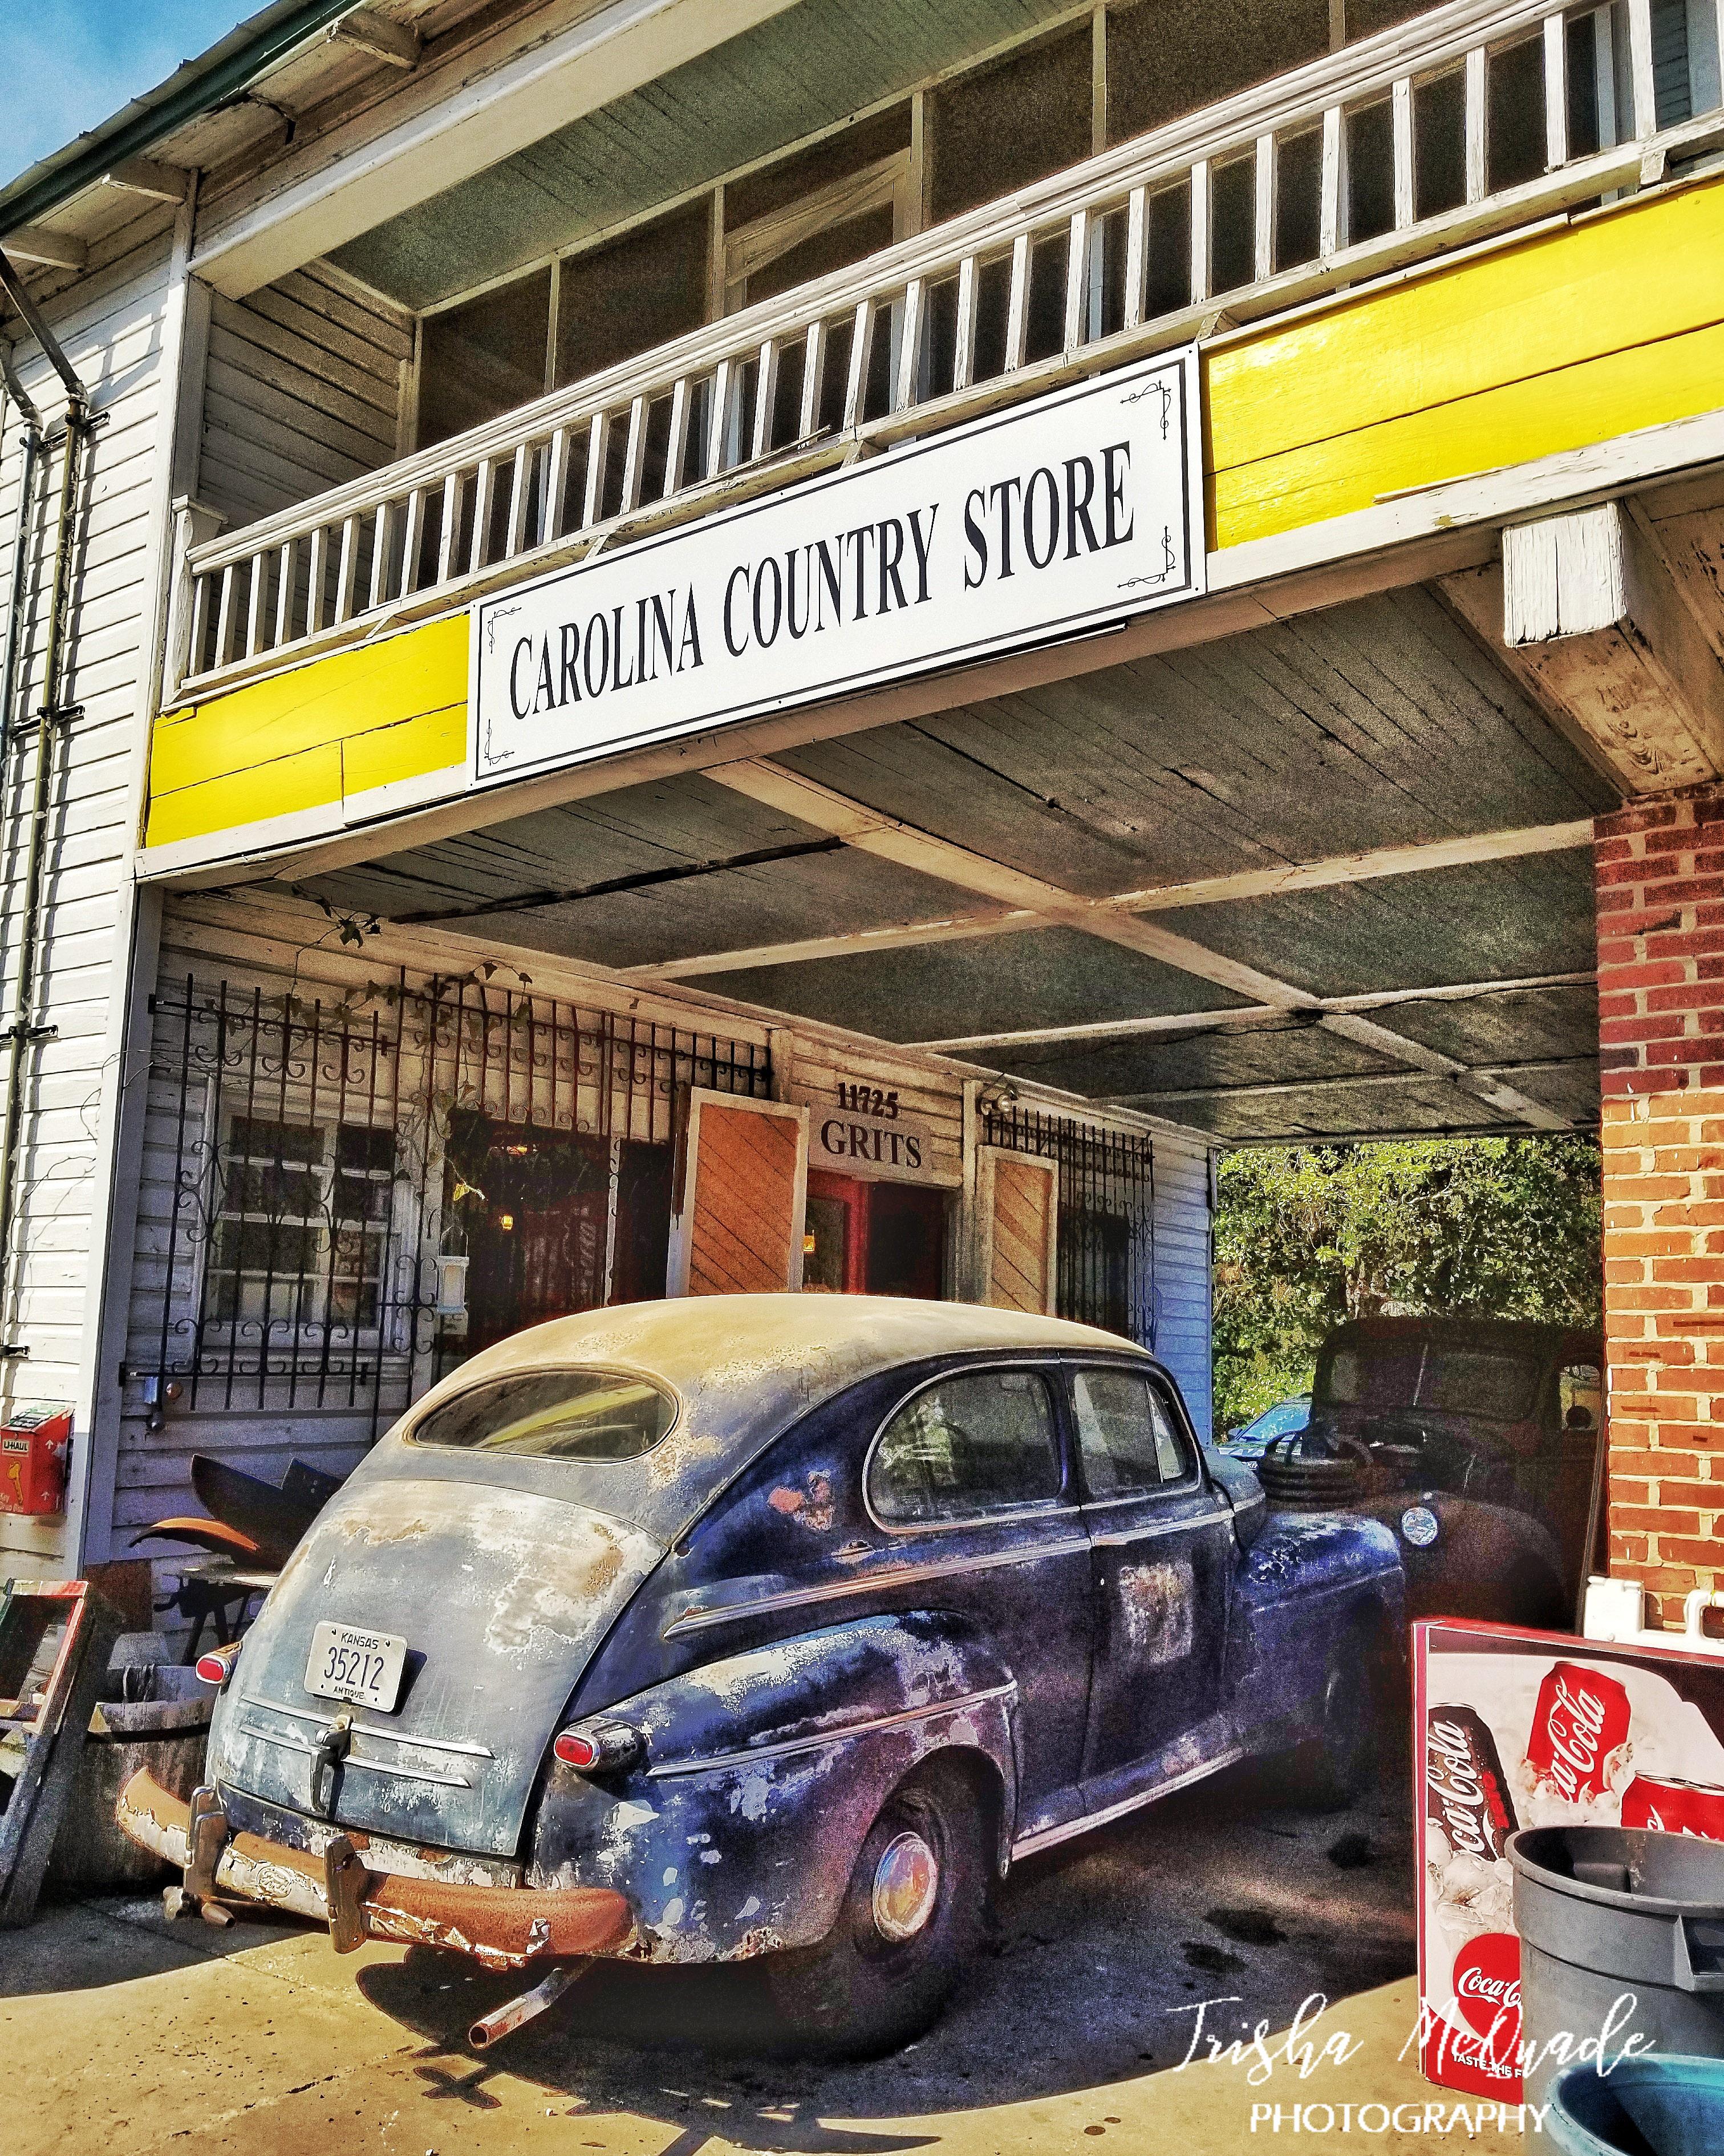 Carolina Country Store